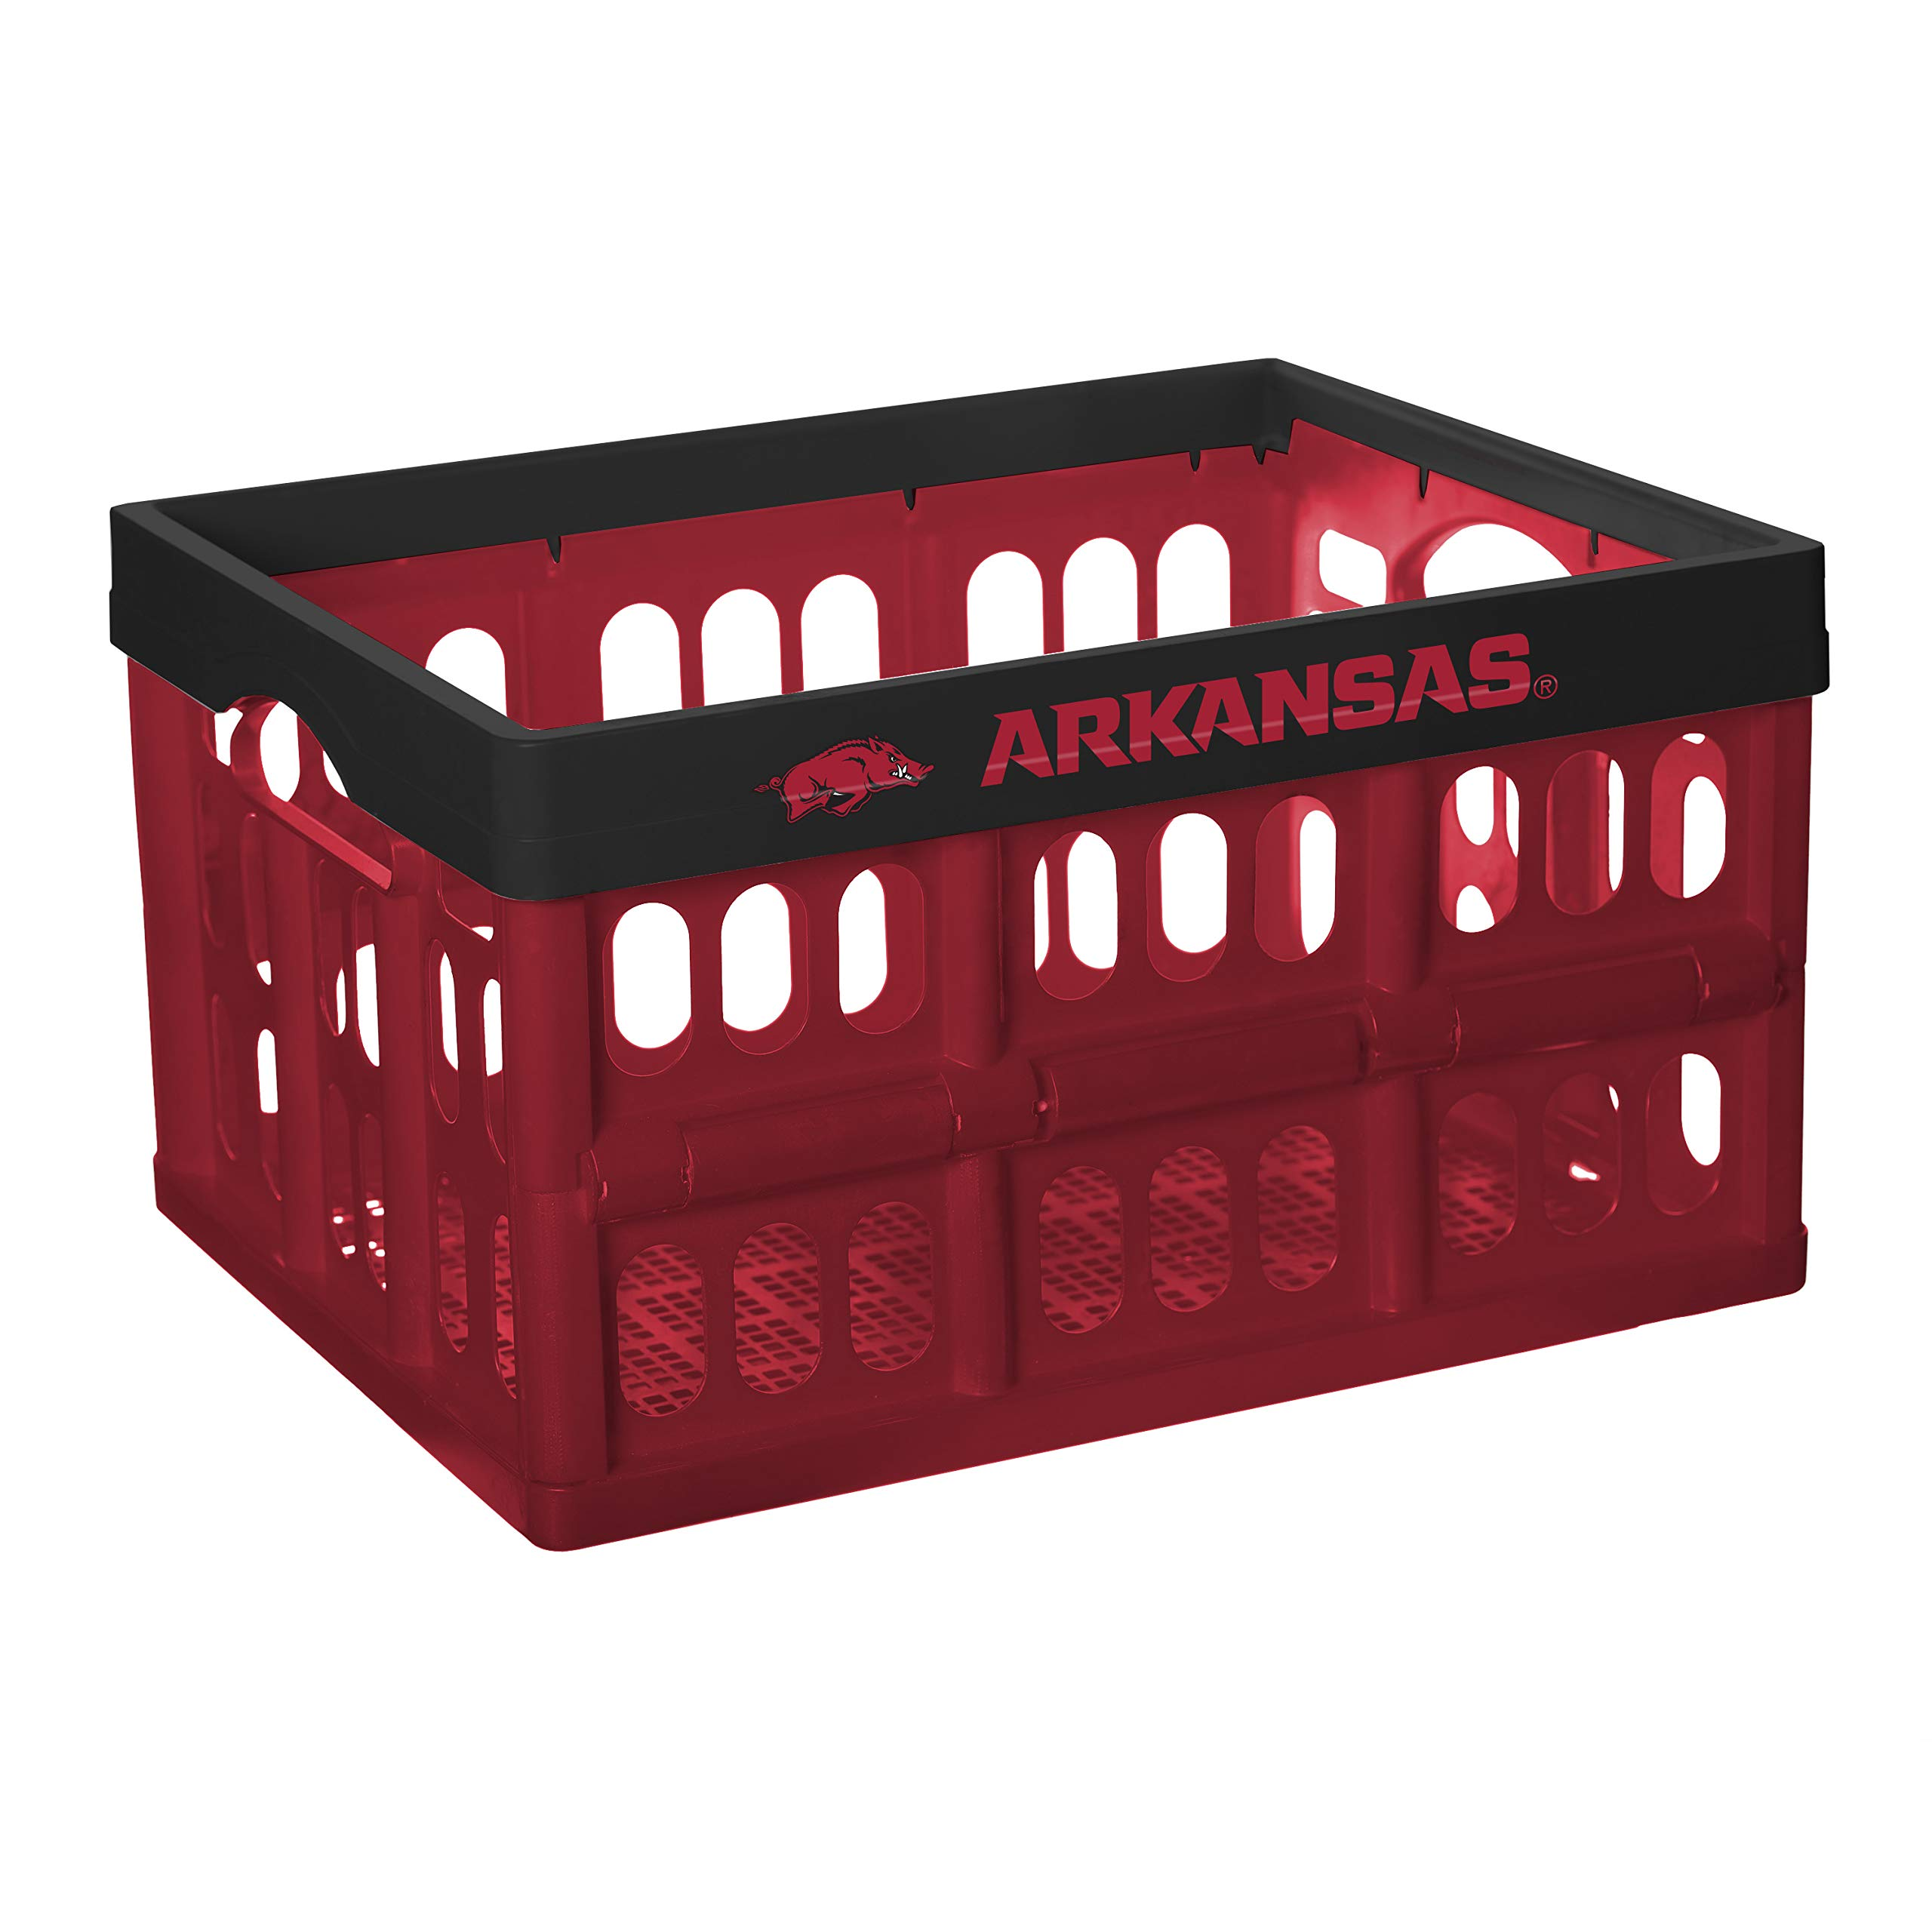 NCAA Fabrique Innovations Collapsible Crate, Arkansas Razorbacks